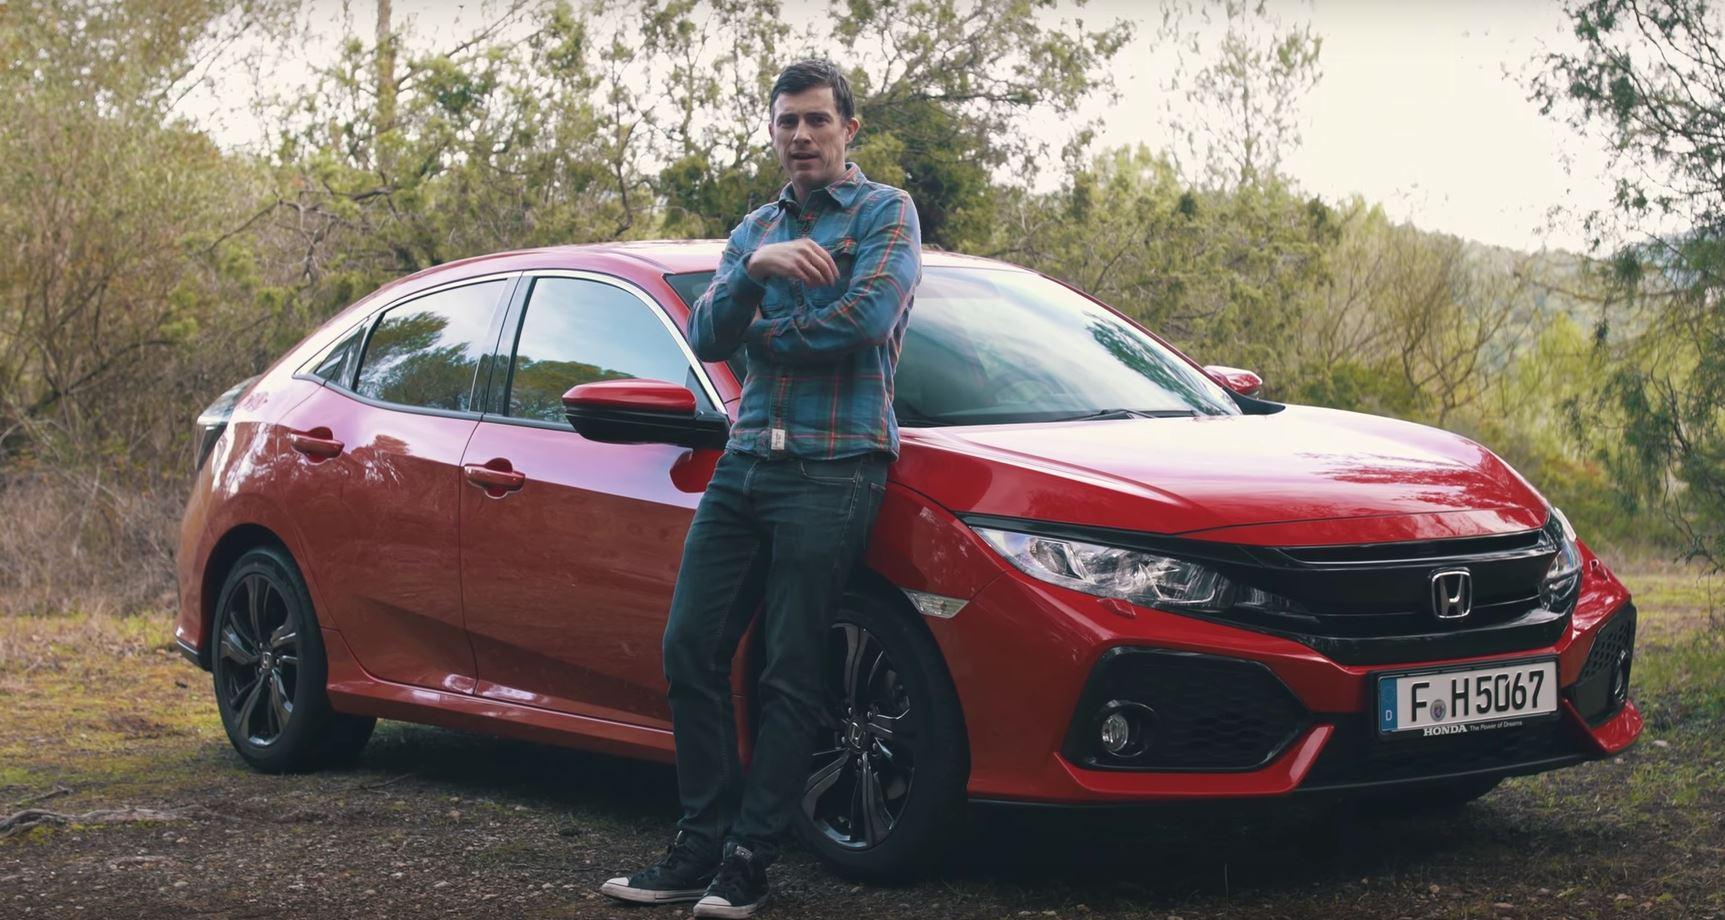 2017 Honda Civic European Reviews Say Itu0027s Not The Best In Class